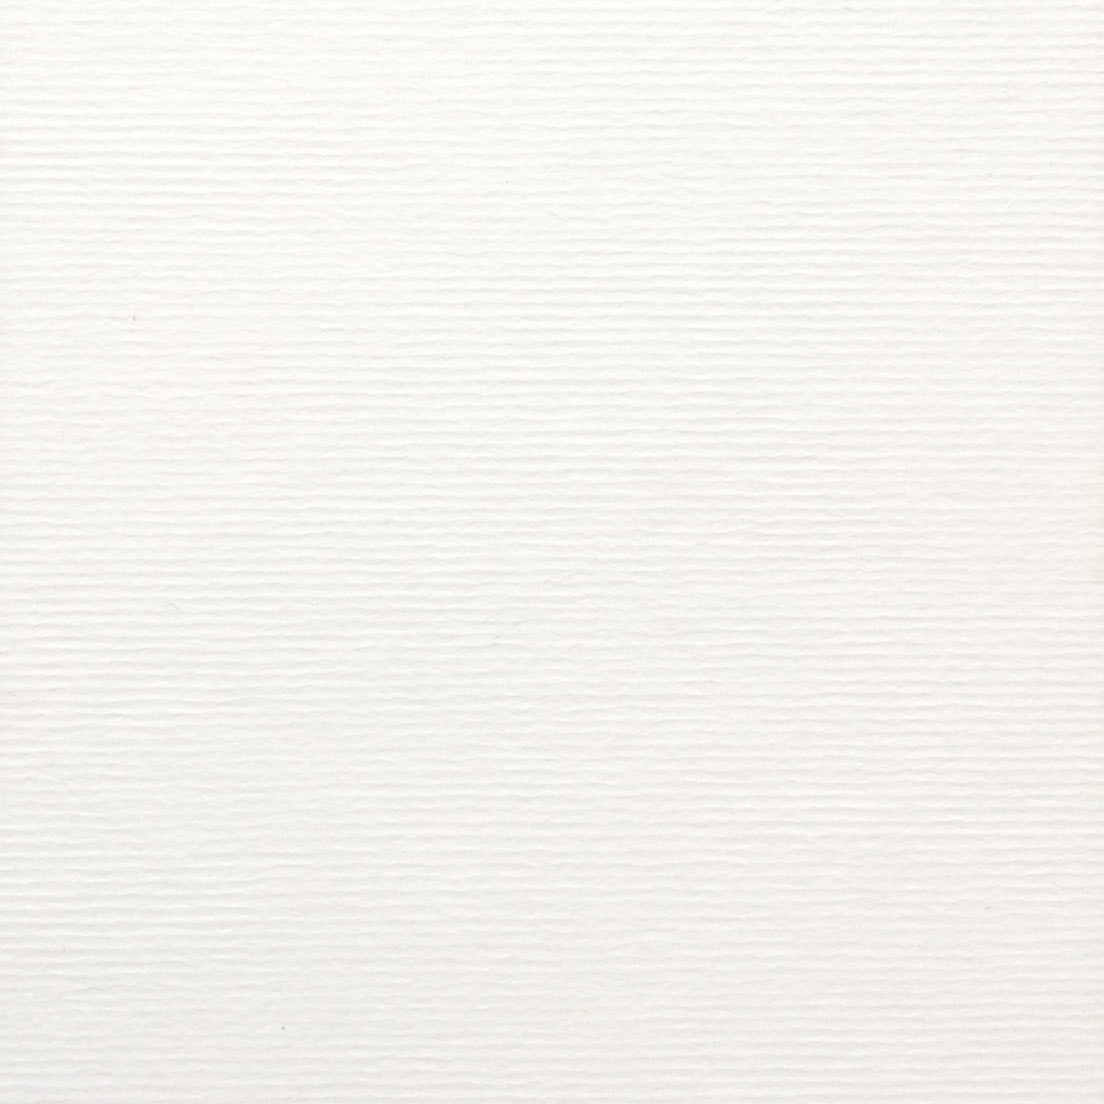 2,3 mm standaard passe-partout met individueel knipsel 60x80 cm | arctisch wit